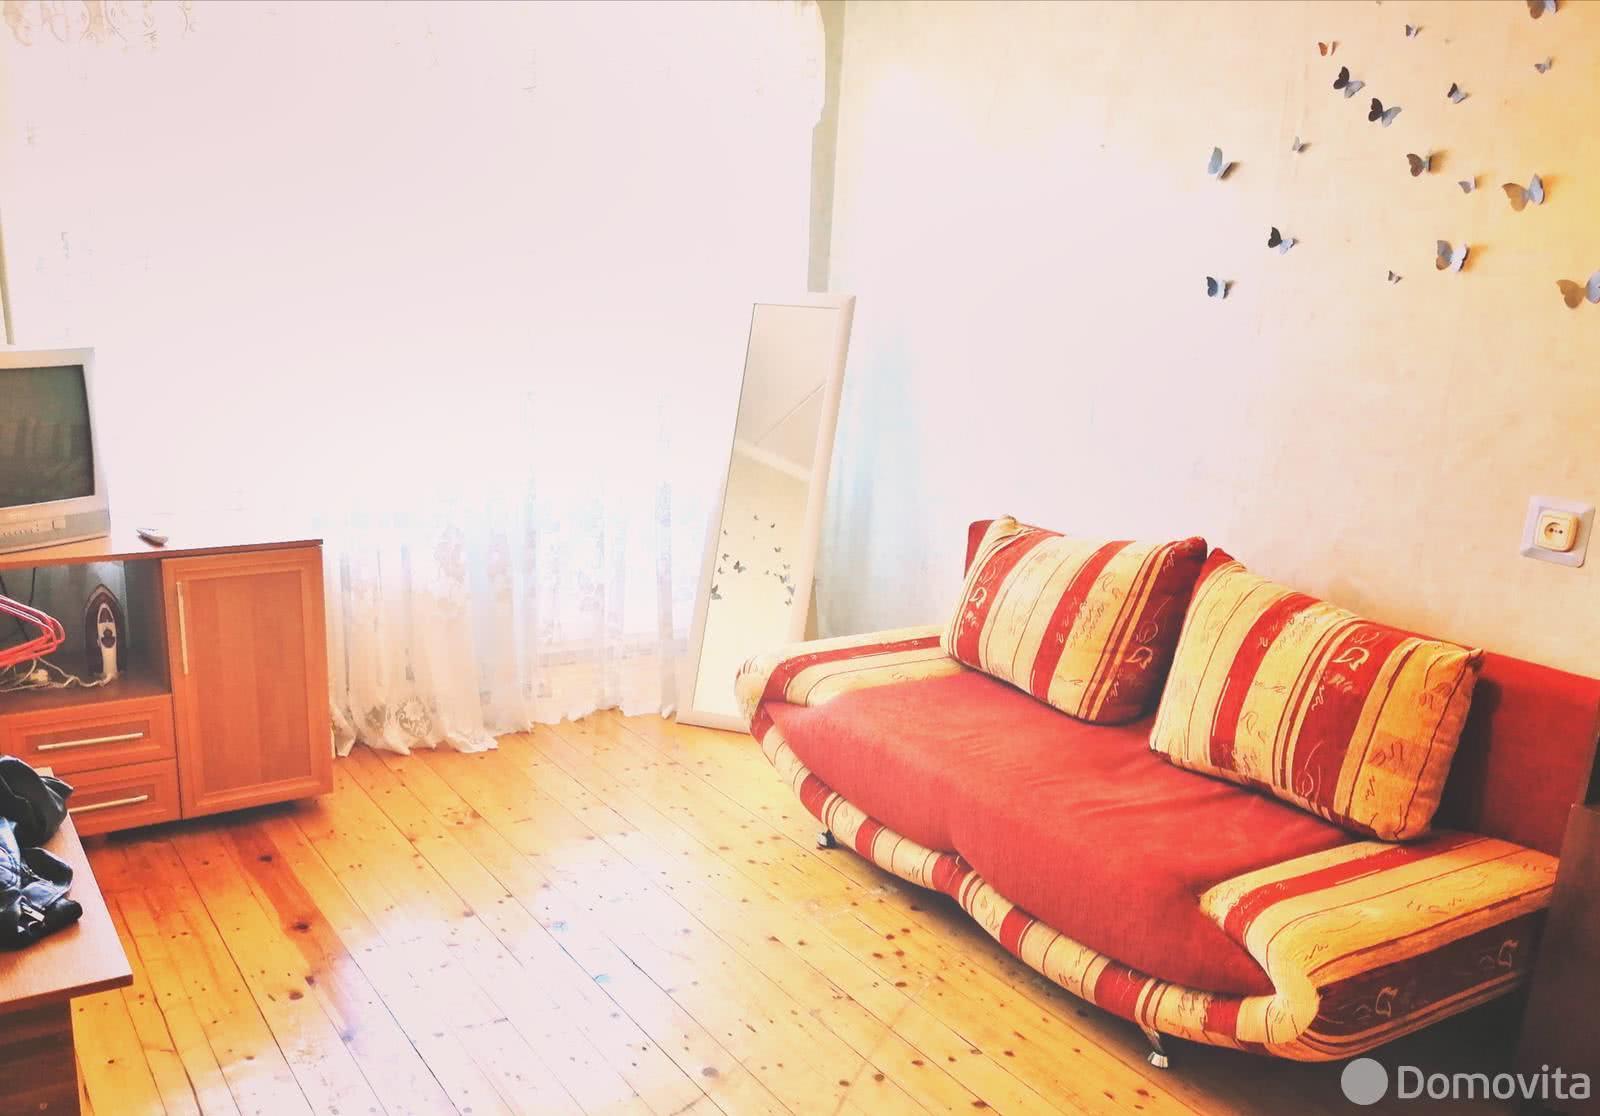 Аренда 1-комнатной квартиры на сутки в Минске ул. Немига, д. 10 - фото 1